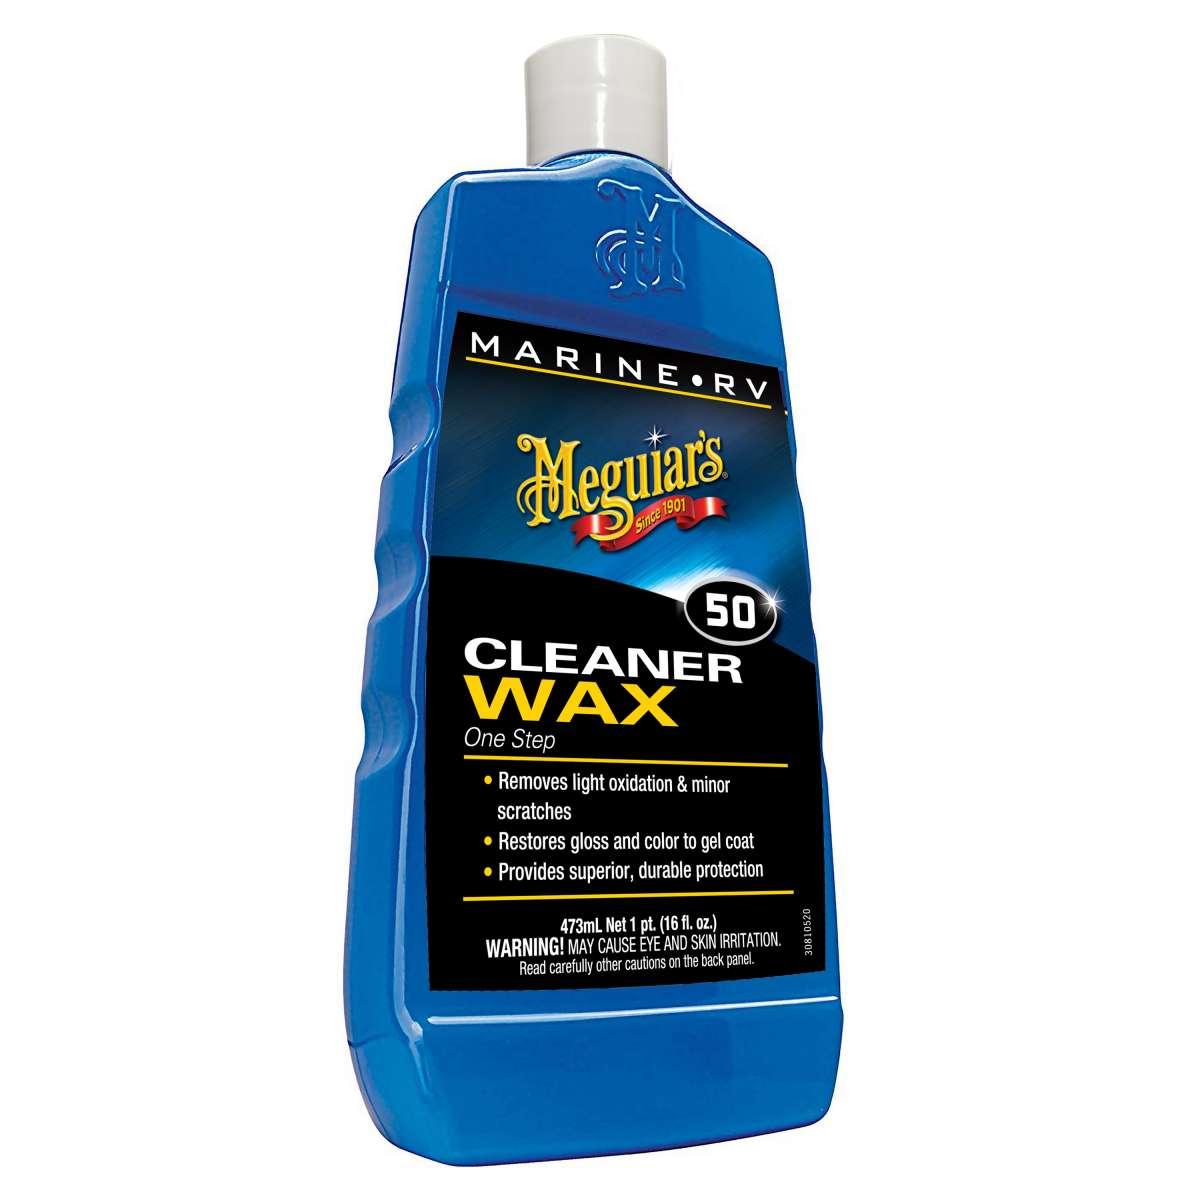 Meguiar's Marine/RV Cleaner Wax